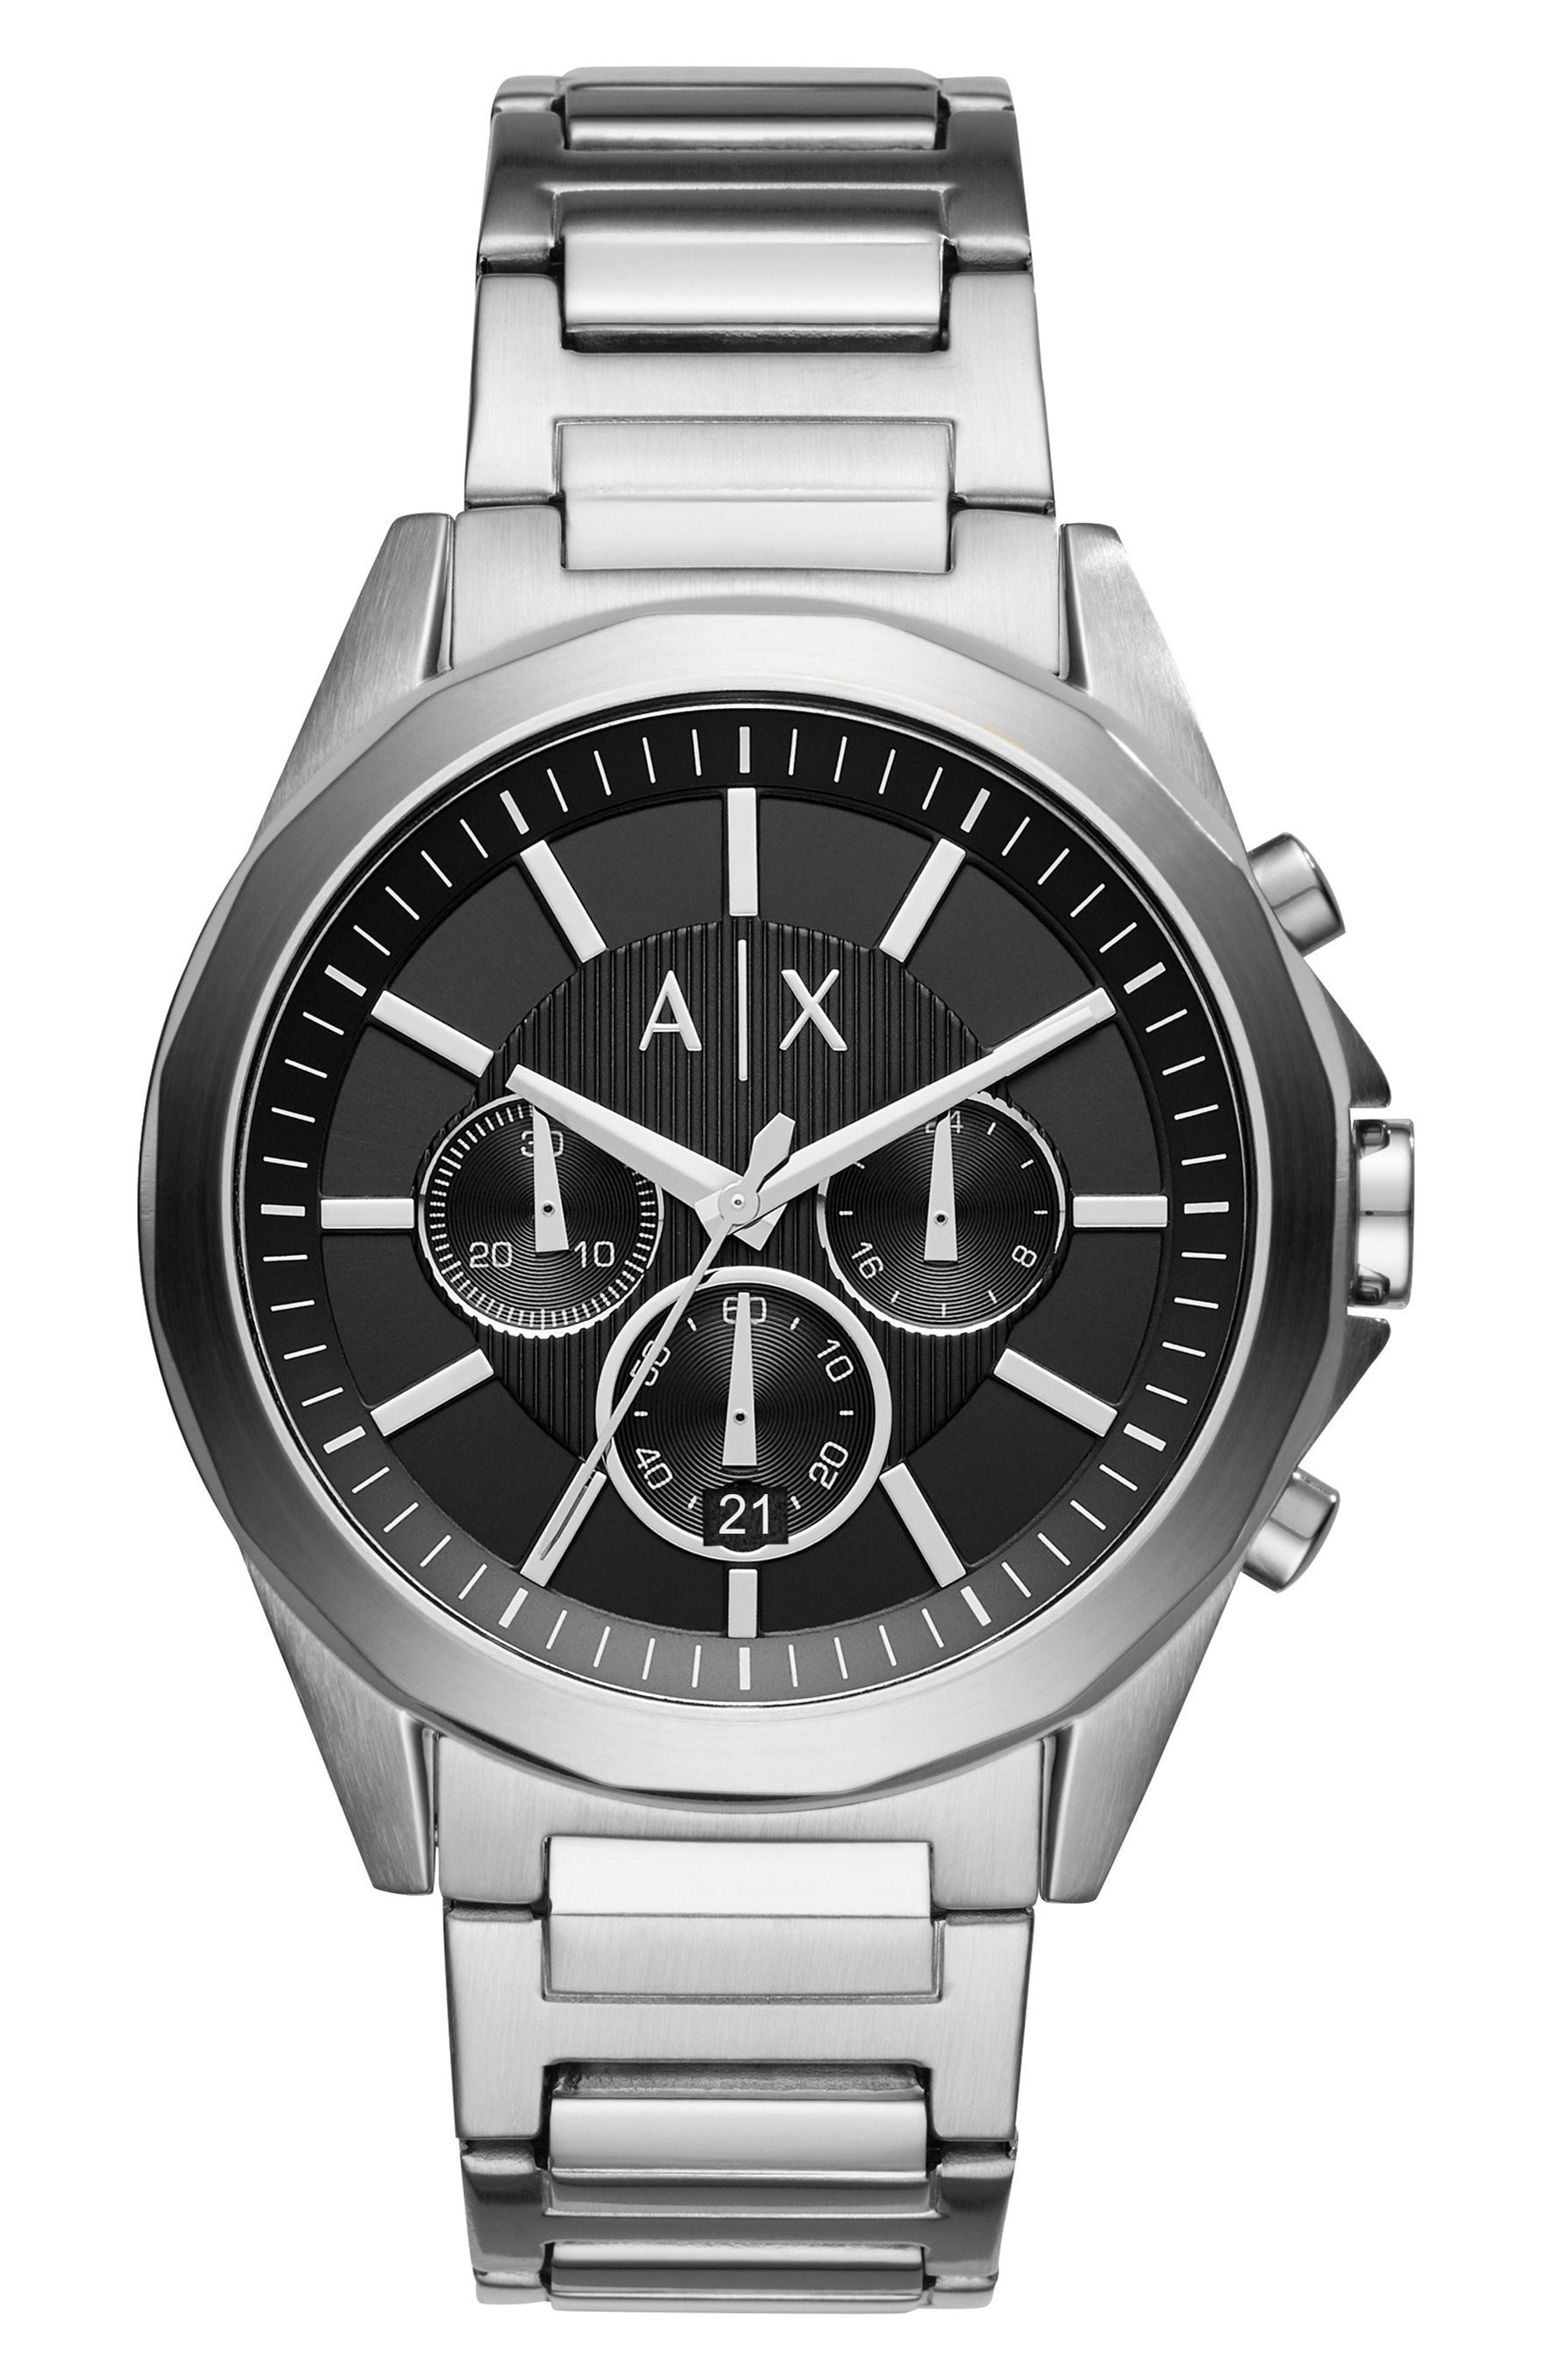 470f6f0048ac Lyst - Armani Exchange Chronograph Bracelet Watch in Metallic for ...